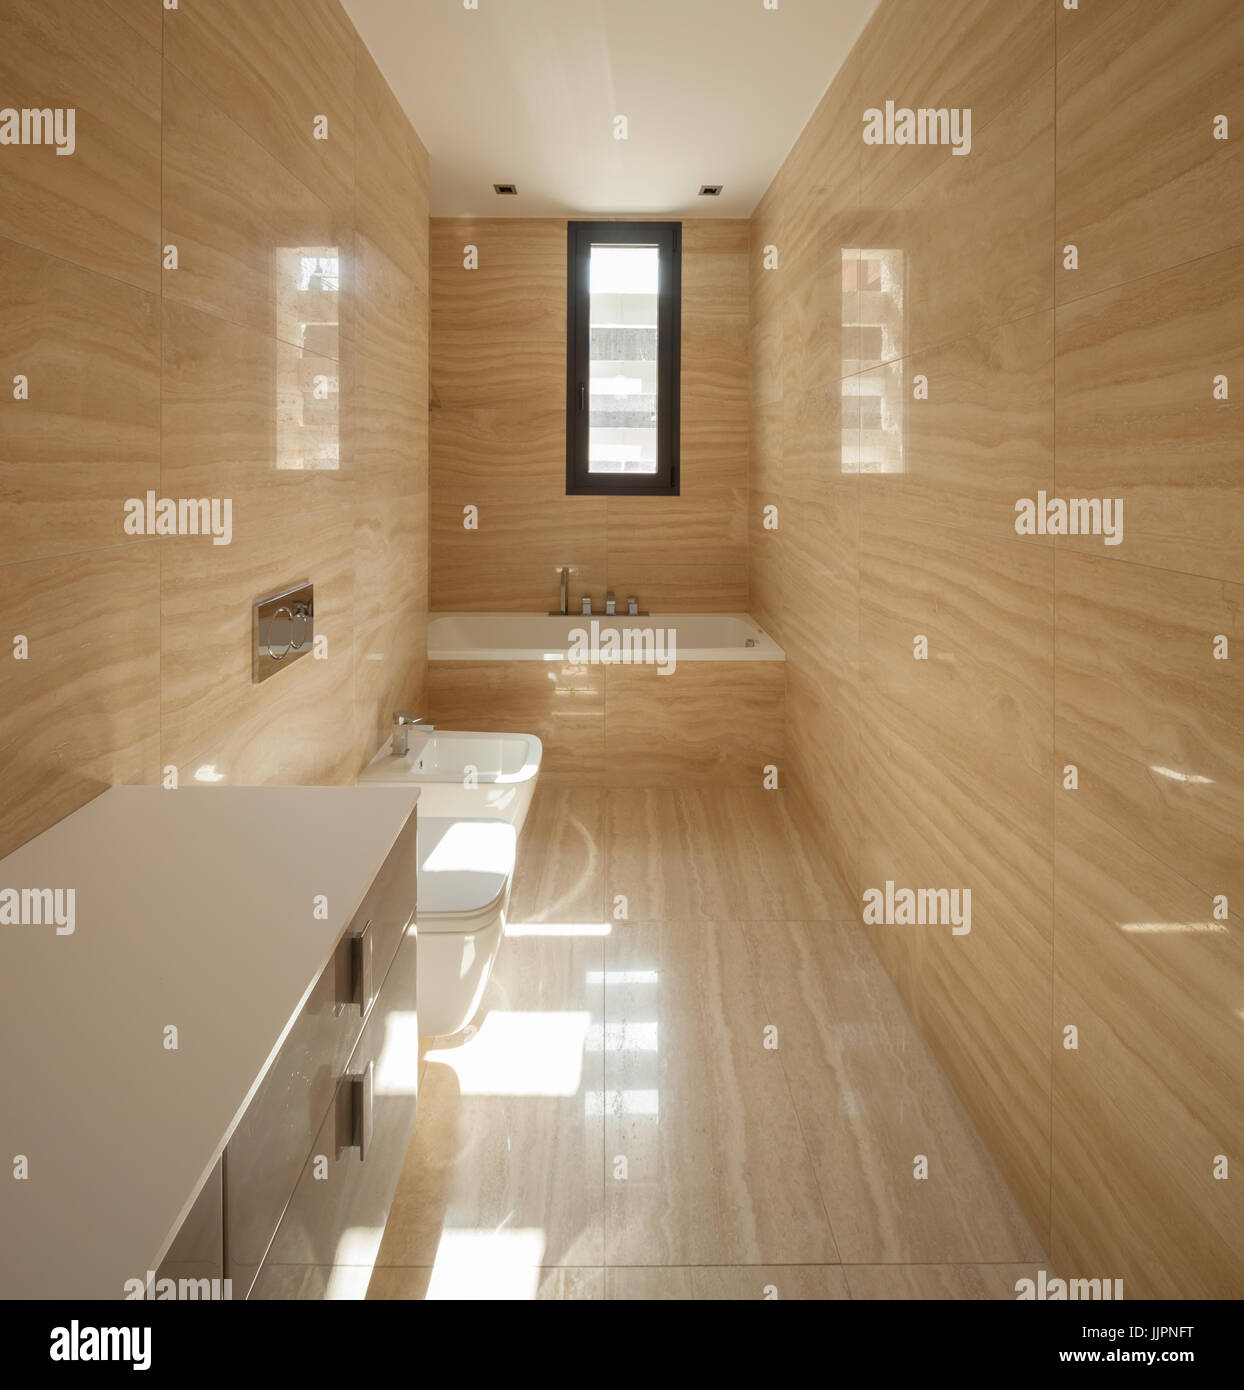 Marble Bathrooms Photos: Streaked Marble Stock Photos & Streaked Marble Stock